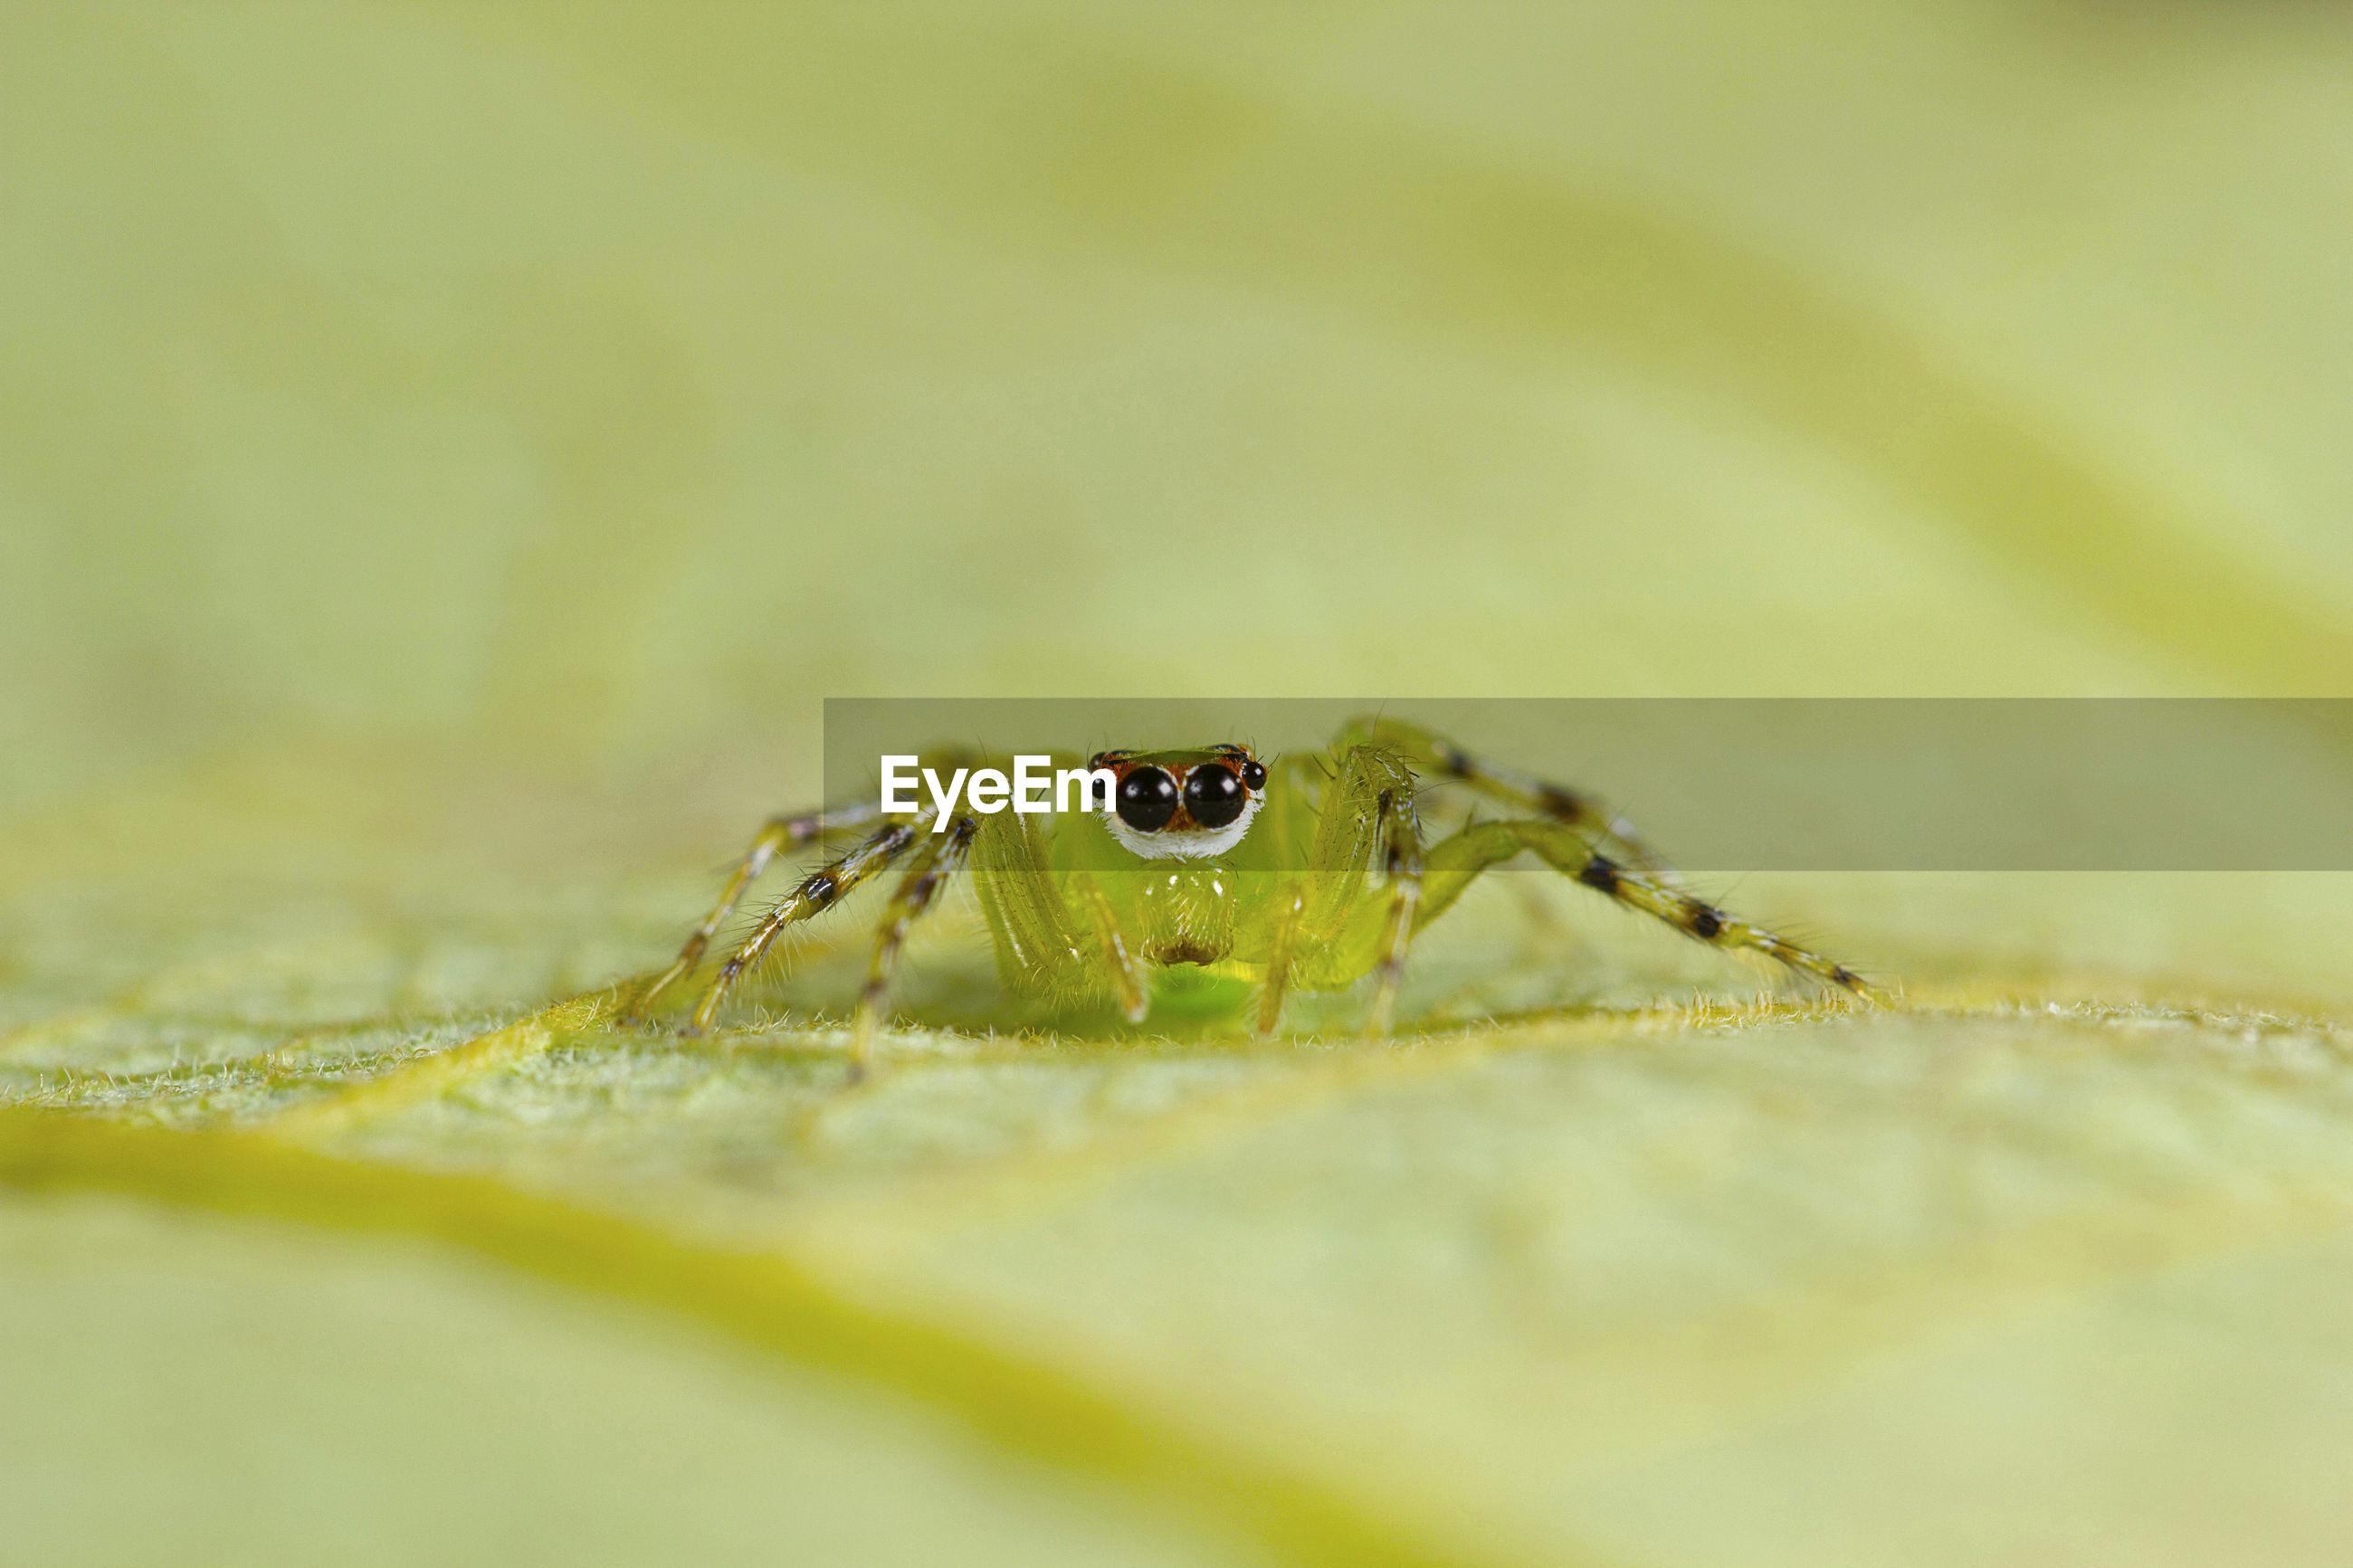 MACRO SHOT OF SPIDER ON LEAF